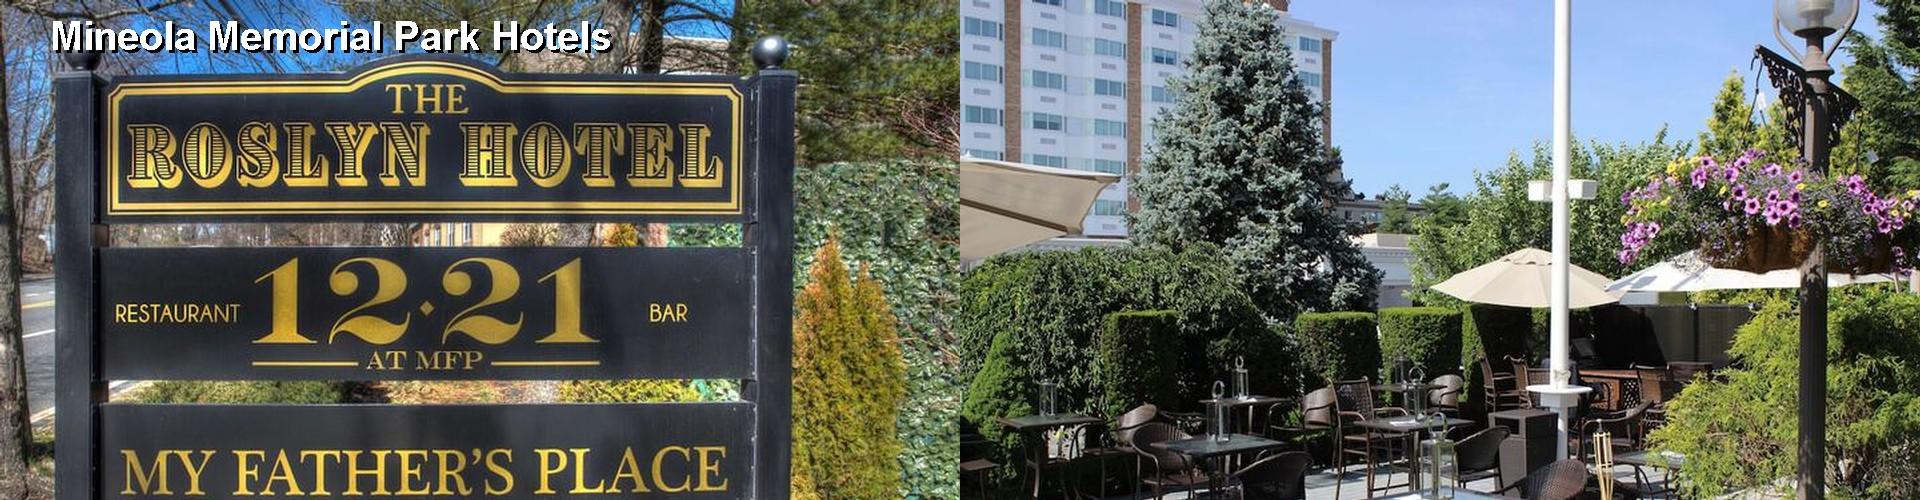 5 Best Hotels Near Mineola Memorial Park